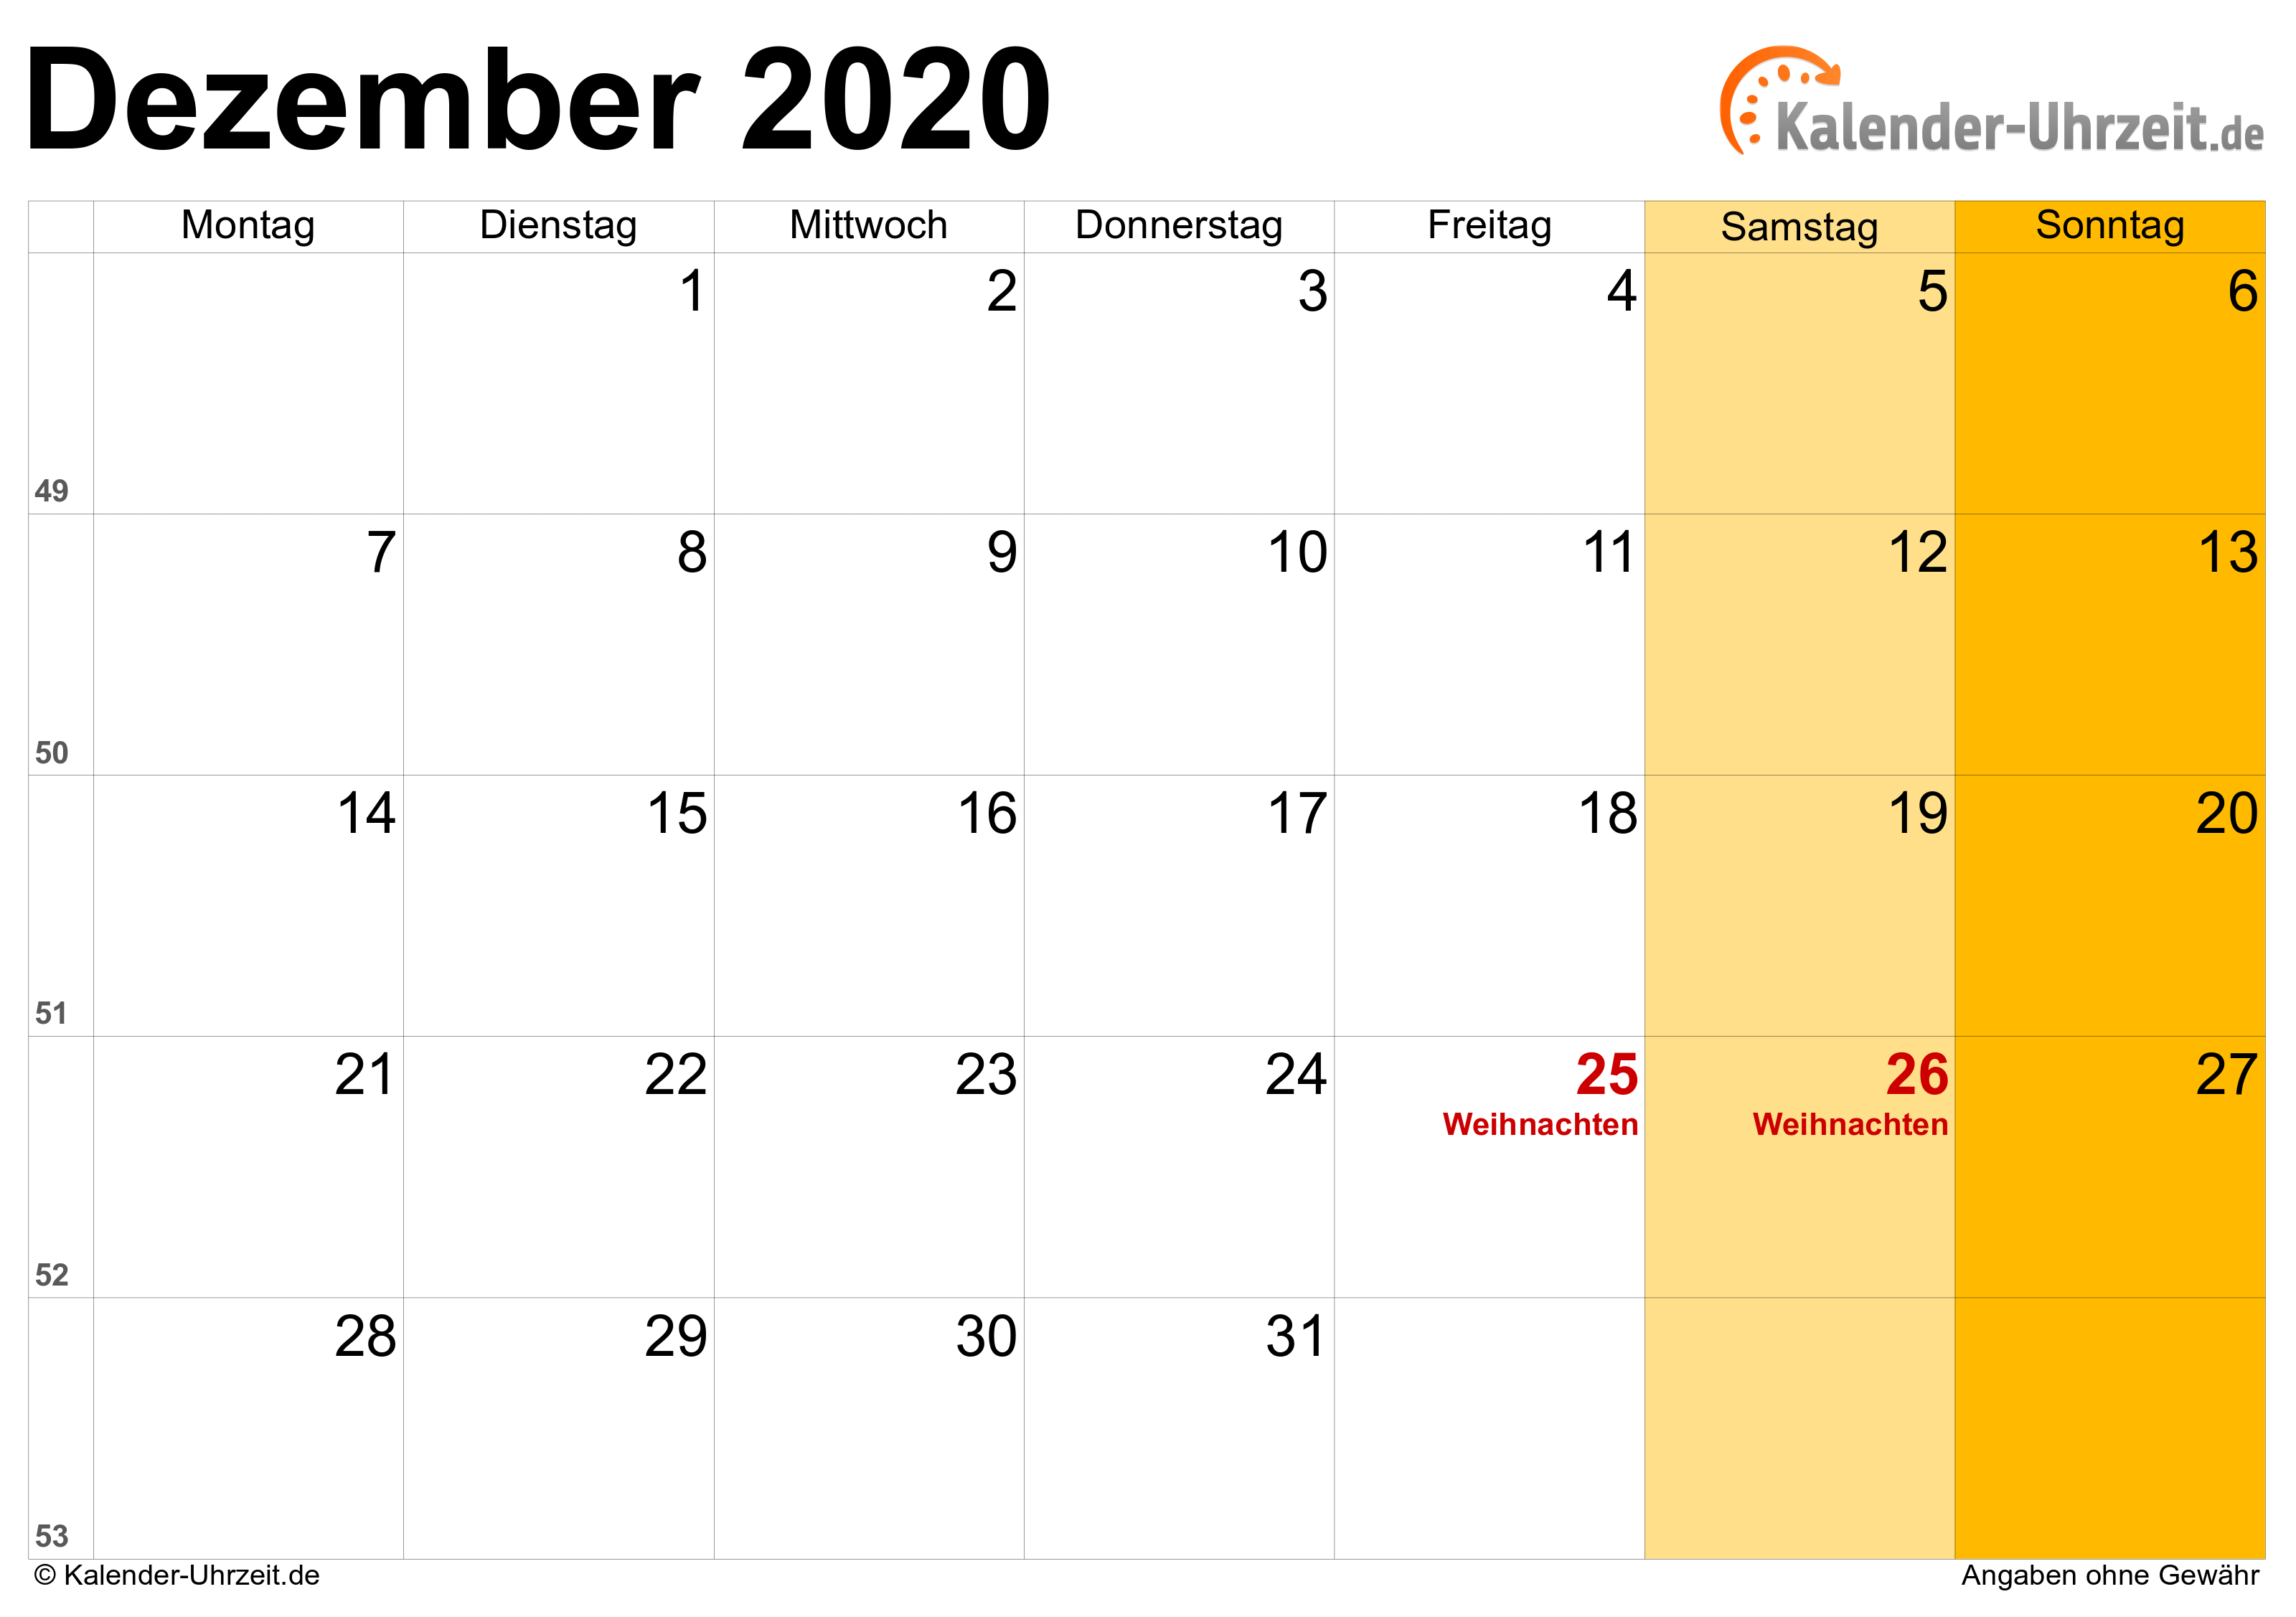 dezember 2020 kalender mit feiertagen. Black Bedroom Furniture Sets. Home Design Ideas